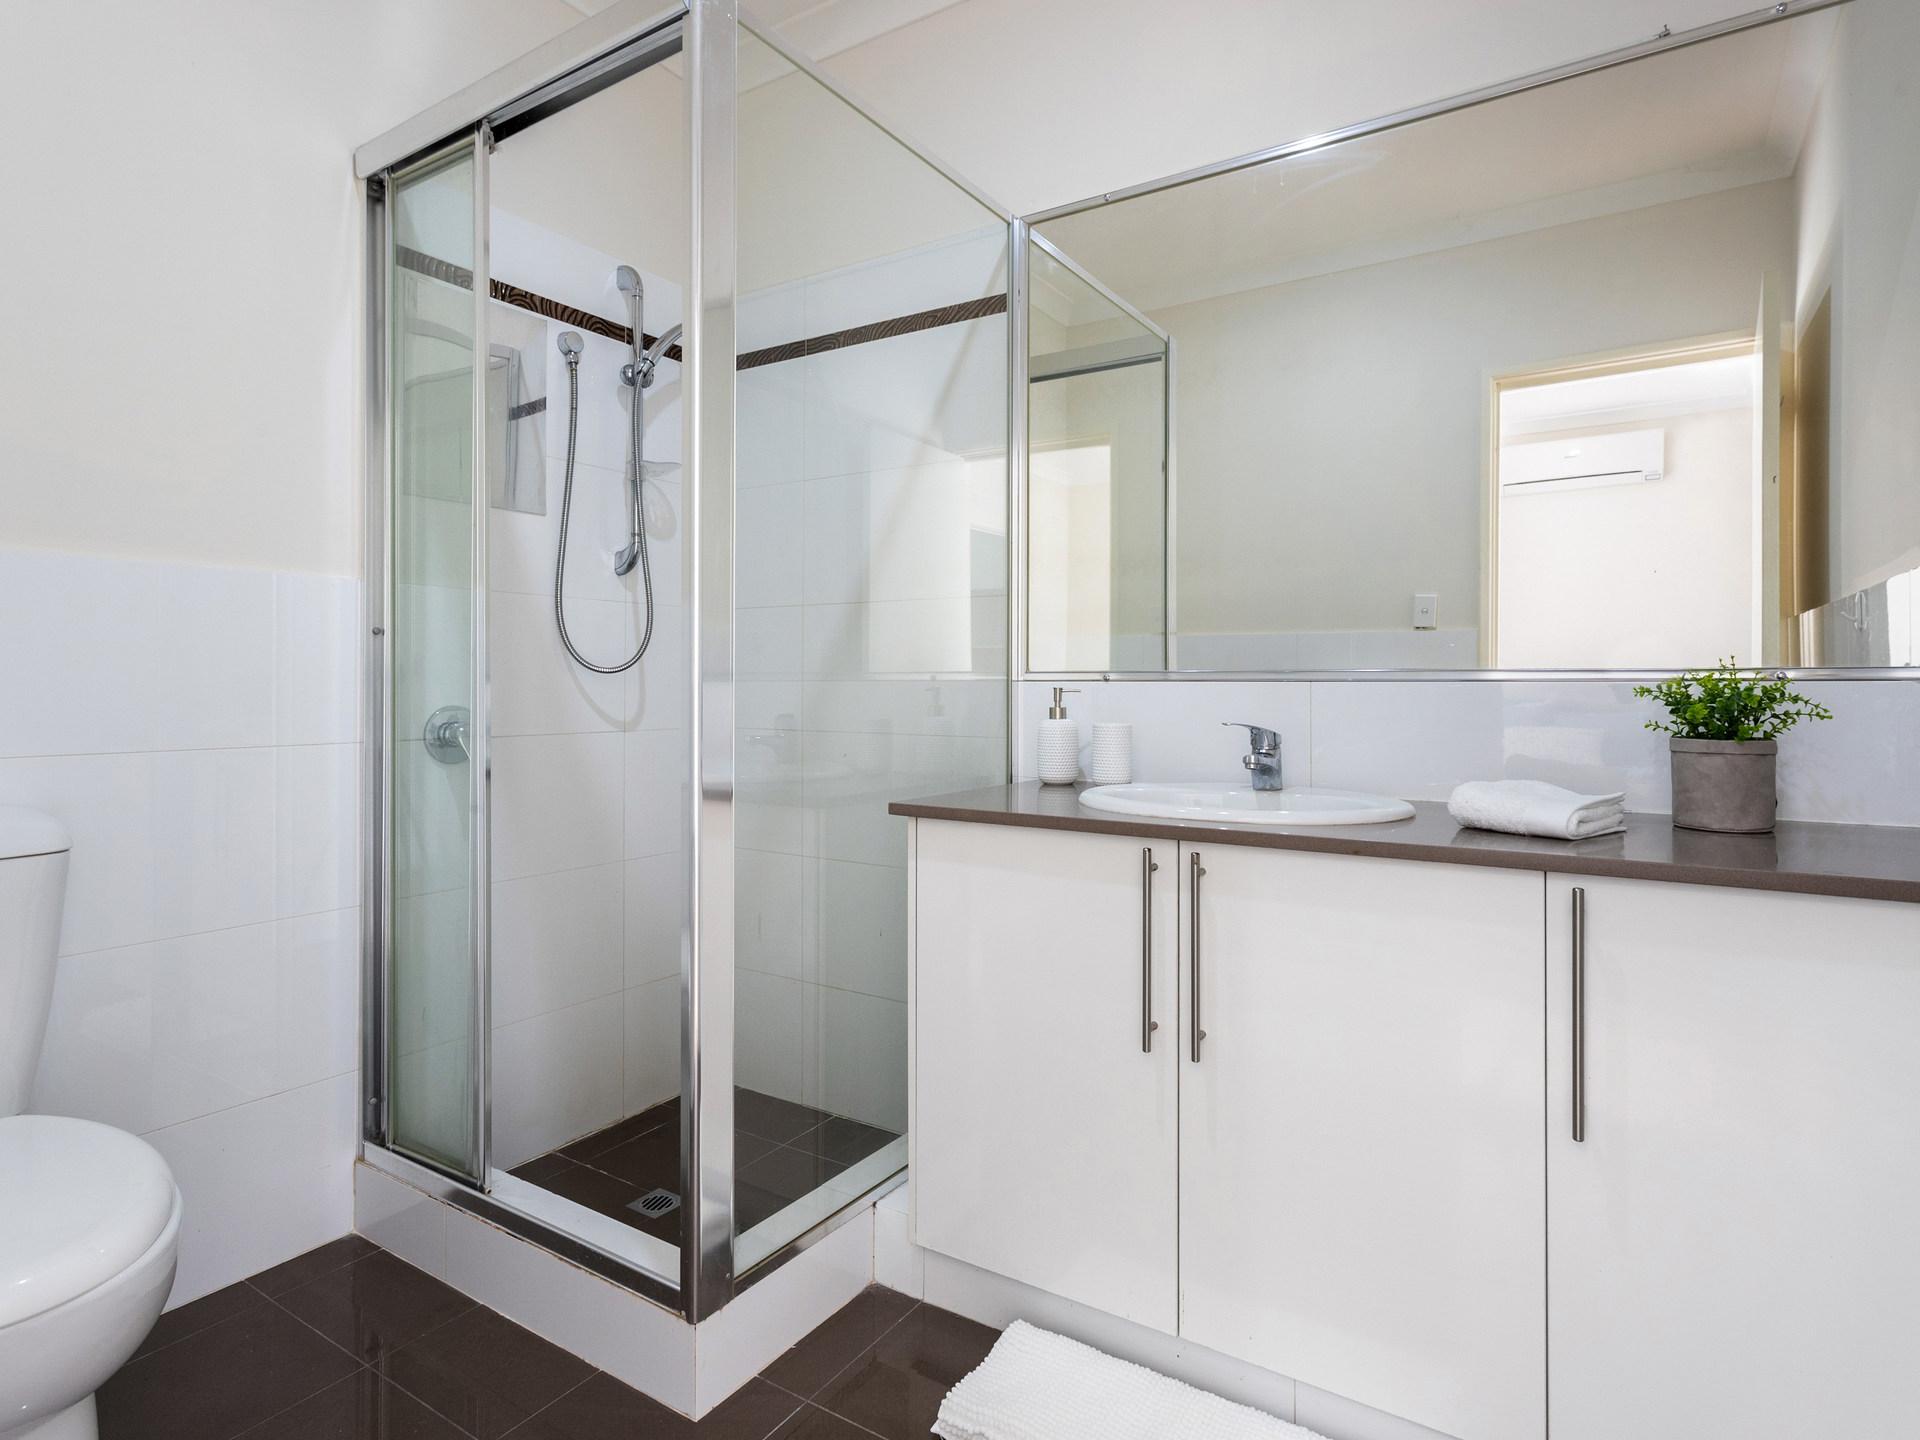 Room 1 Hopkinson Bath